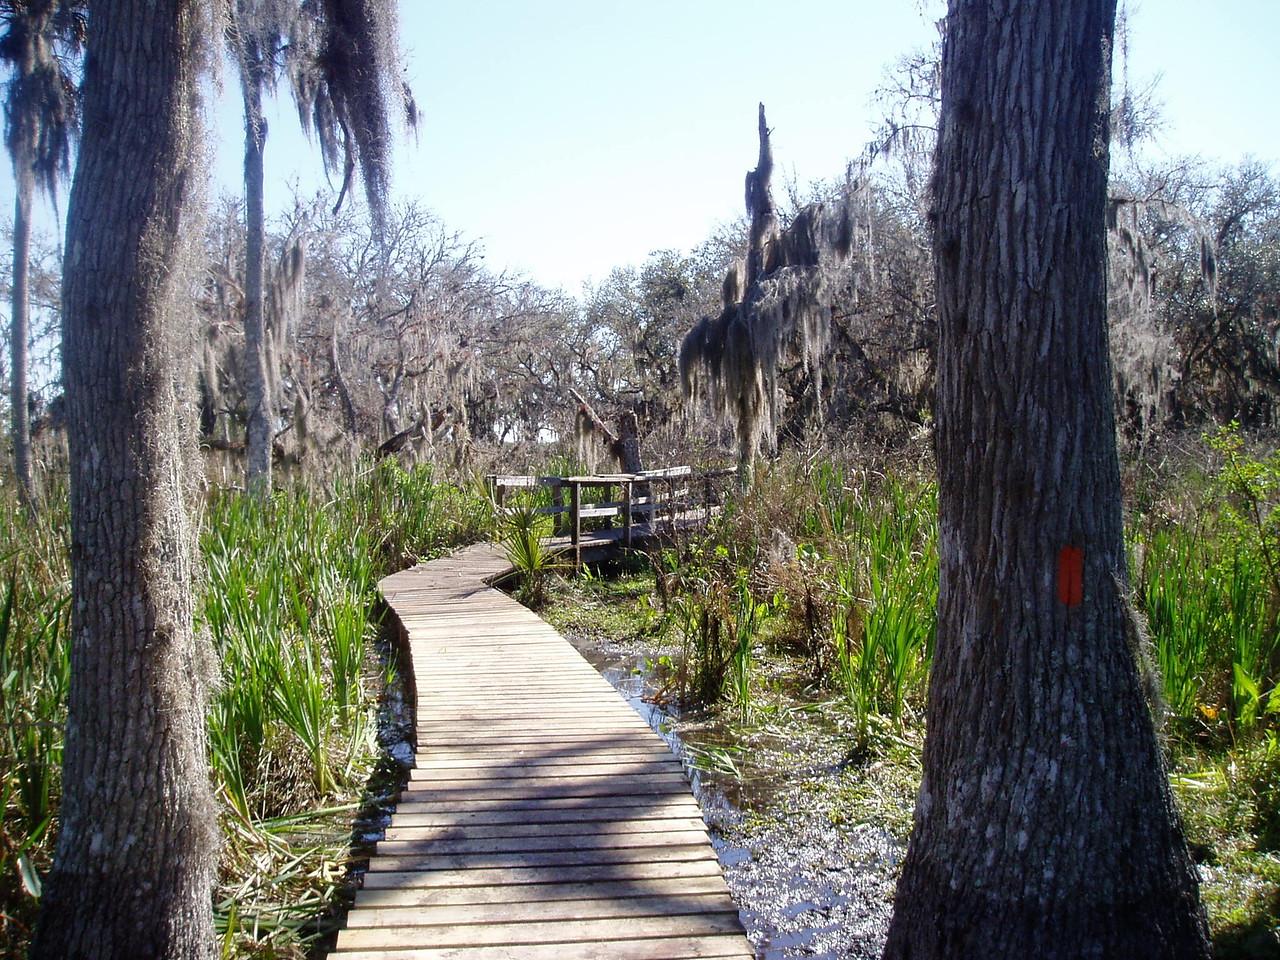 Florida Trail boardwalk<br /> location: Boney Marsh<br /> photo credit: Deb Blick / Florida Trail Association